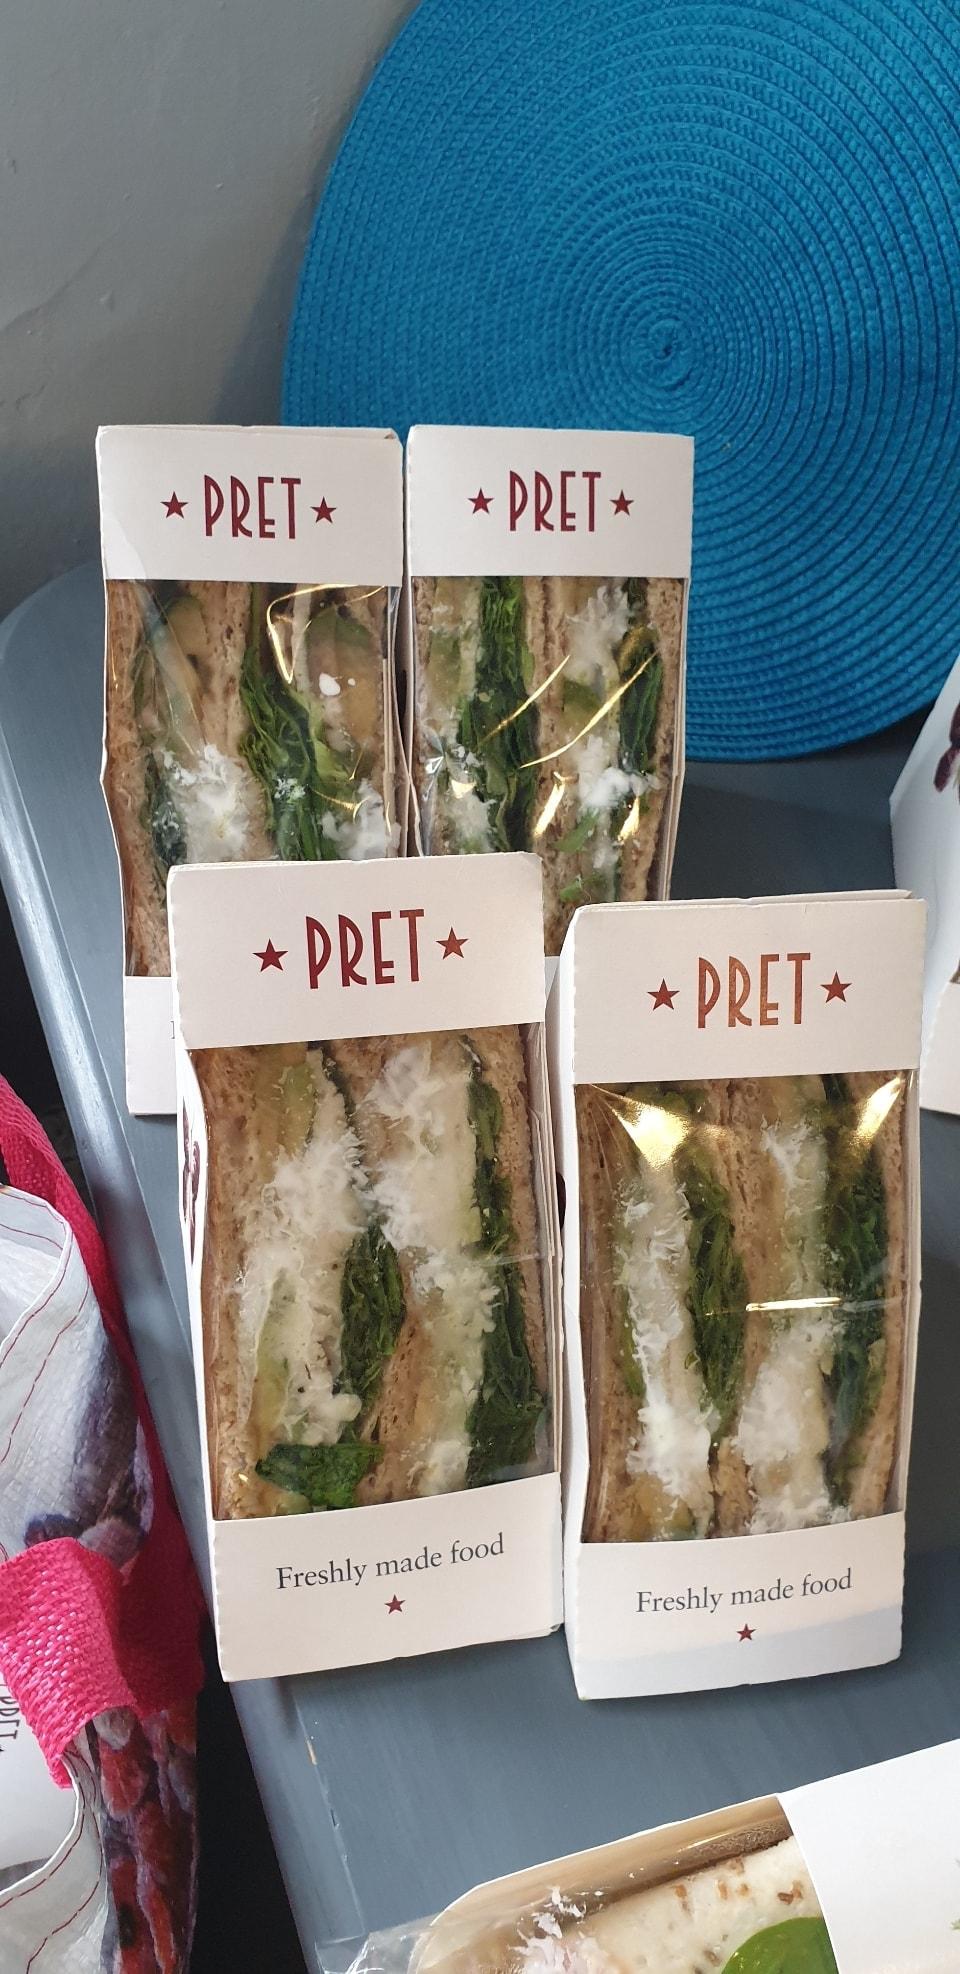 Pret chicken and avocado sandwich